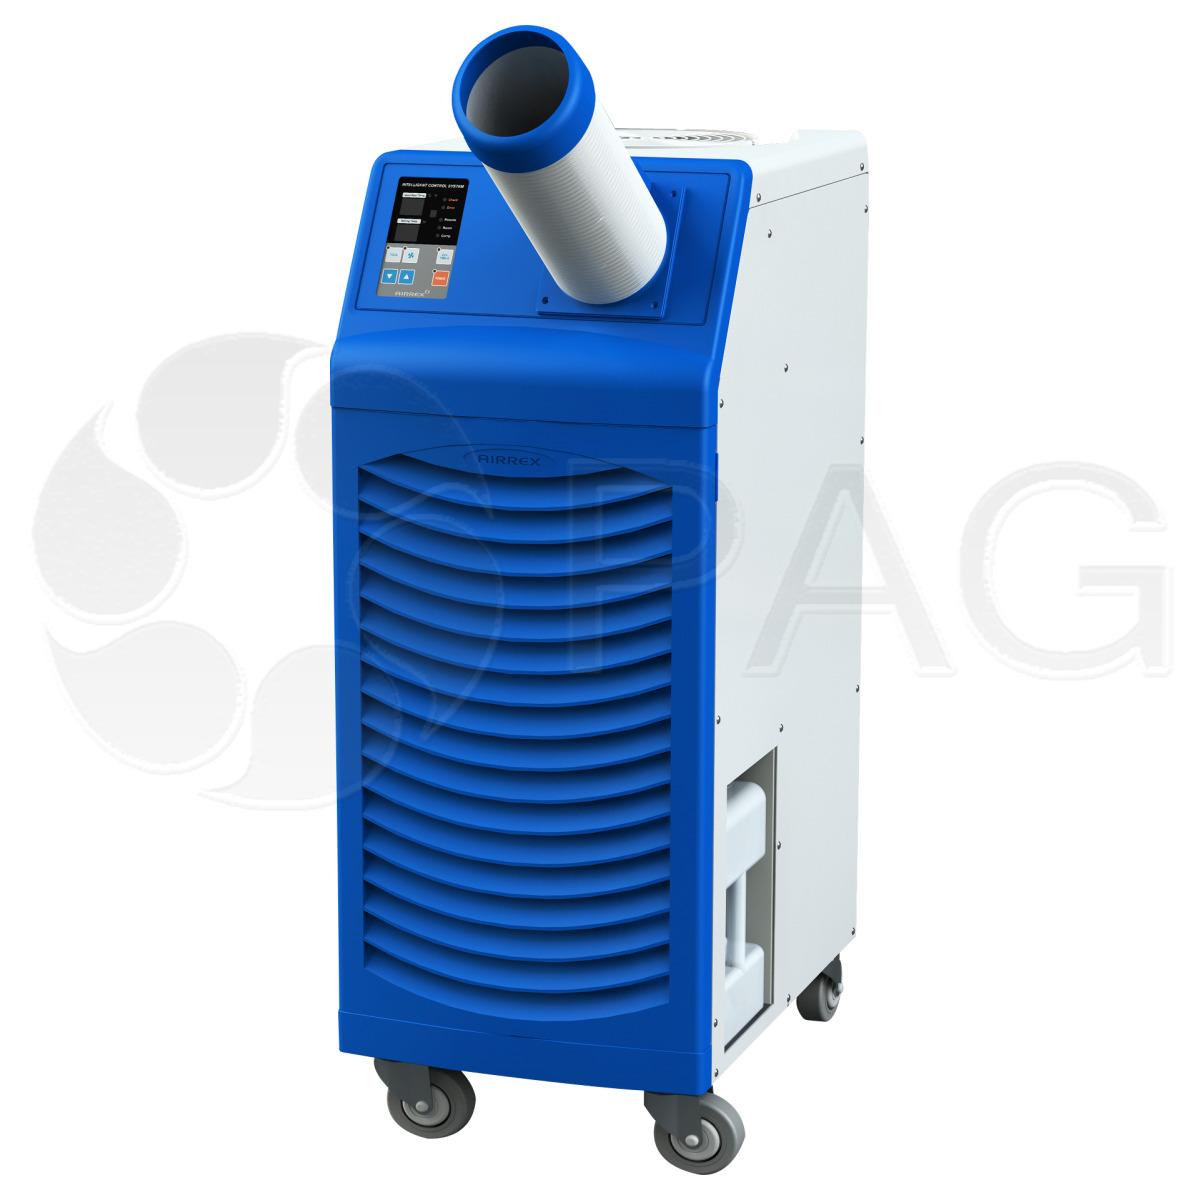 Airrex HSC-12 portable Spot Cooler